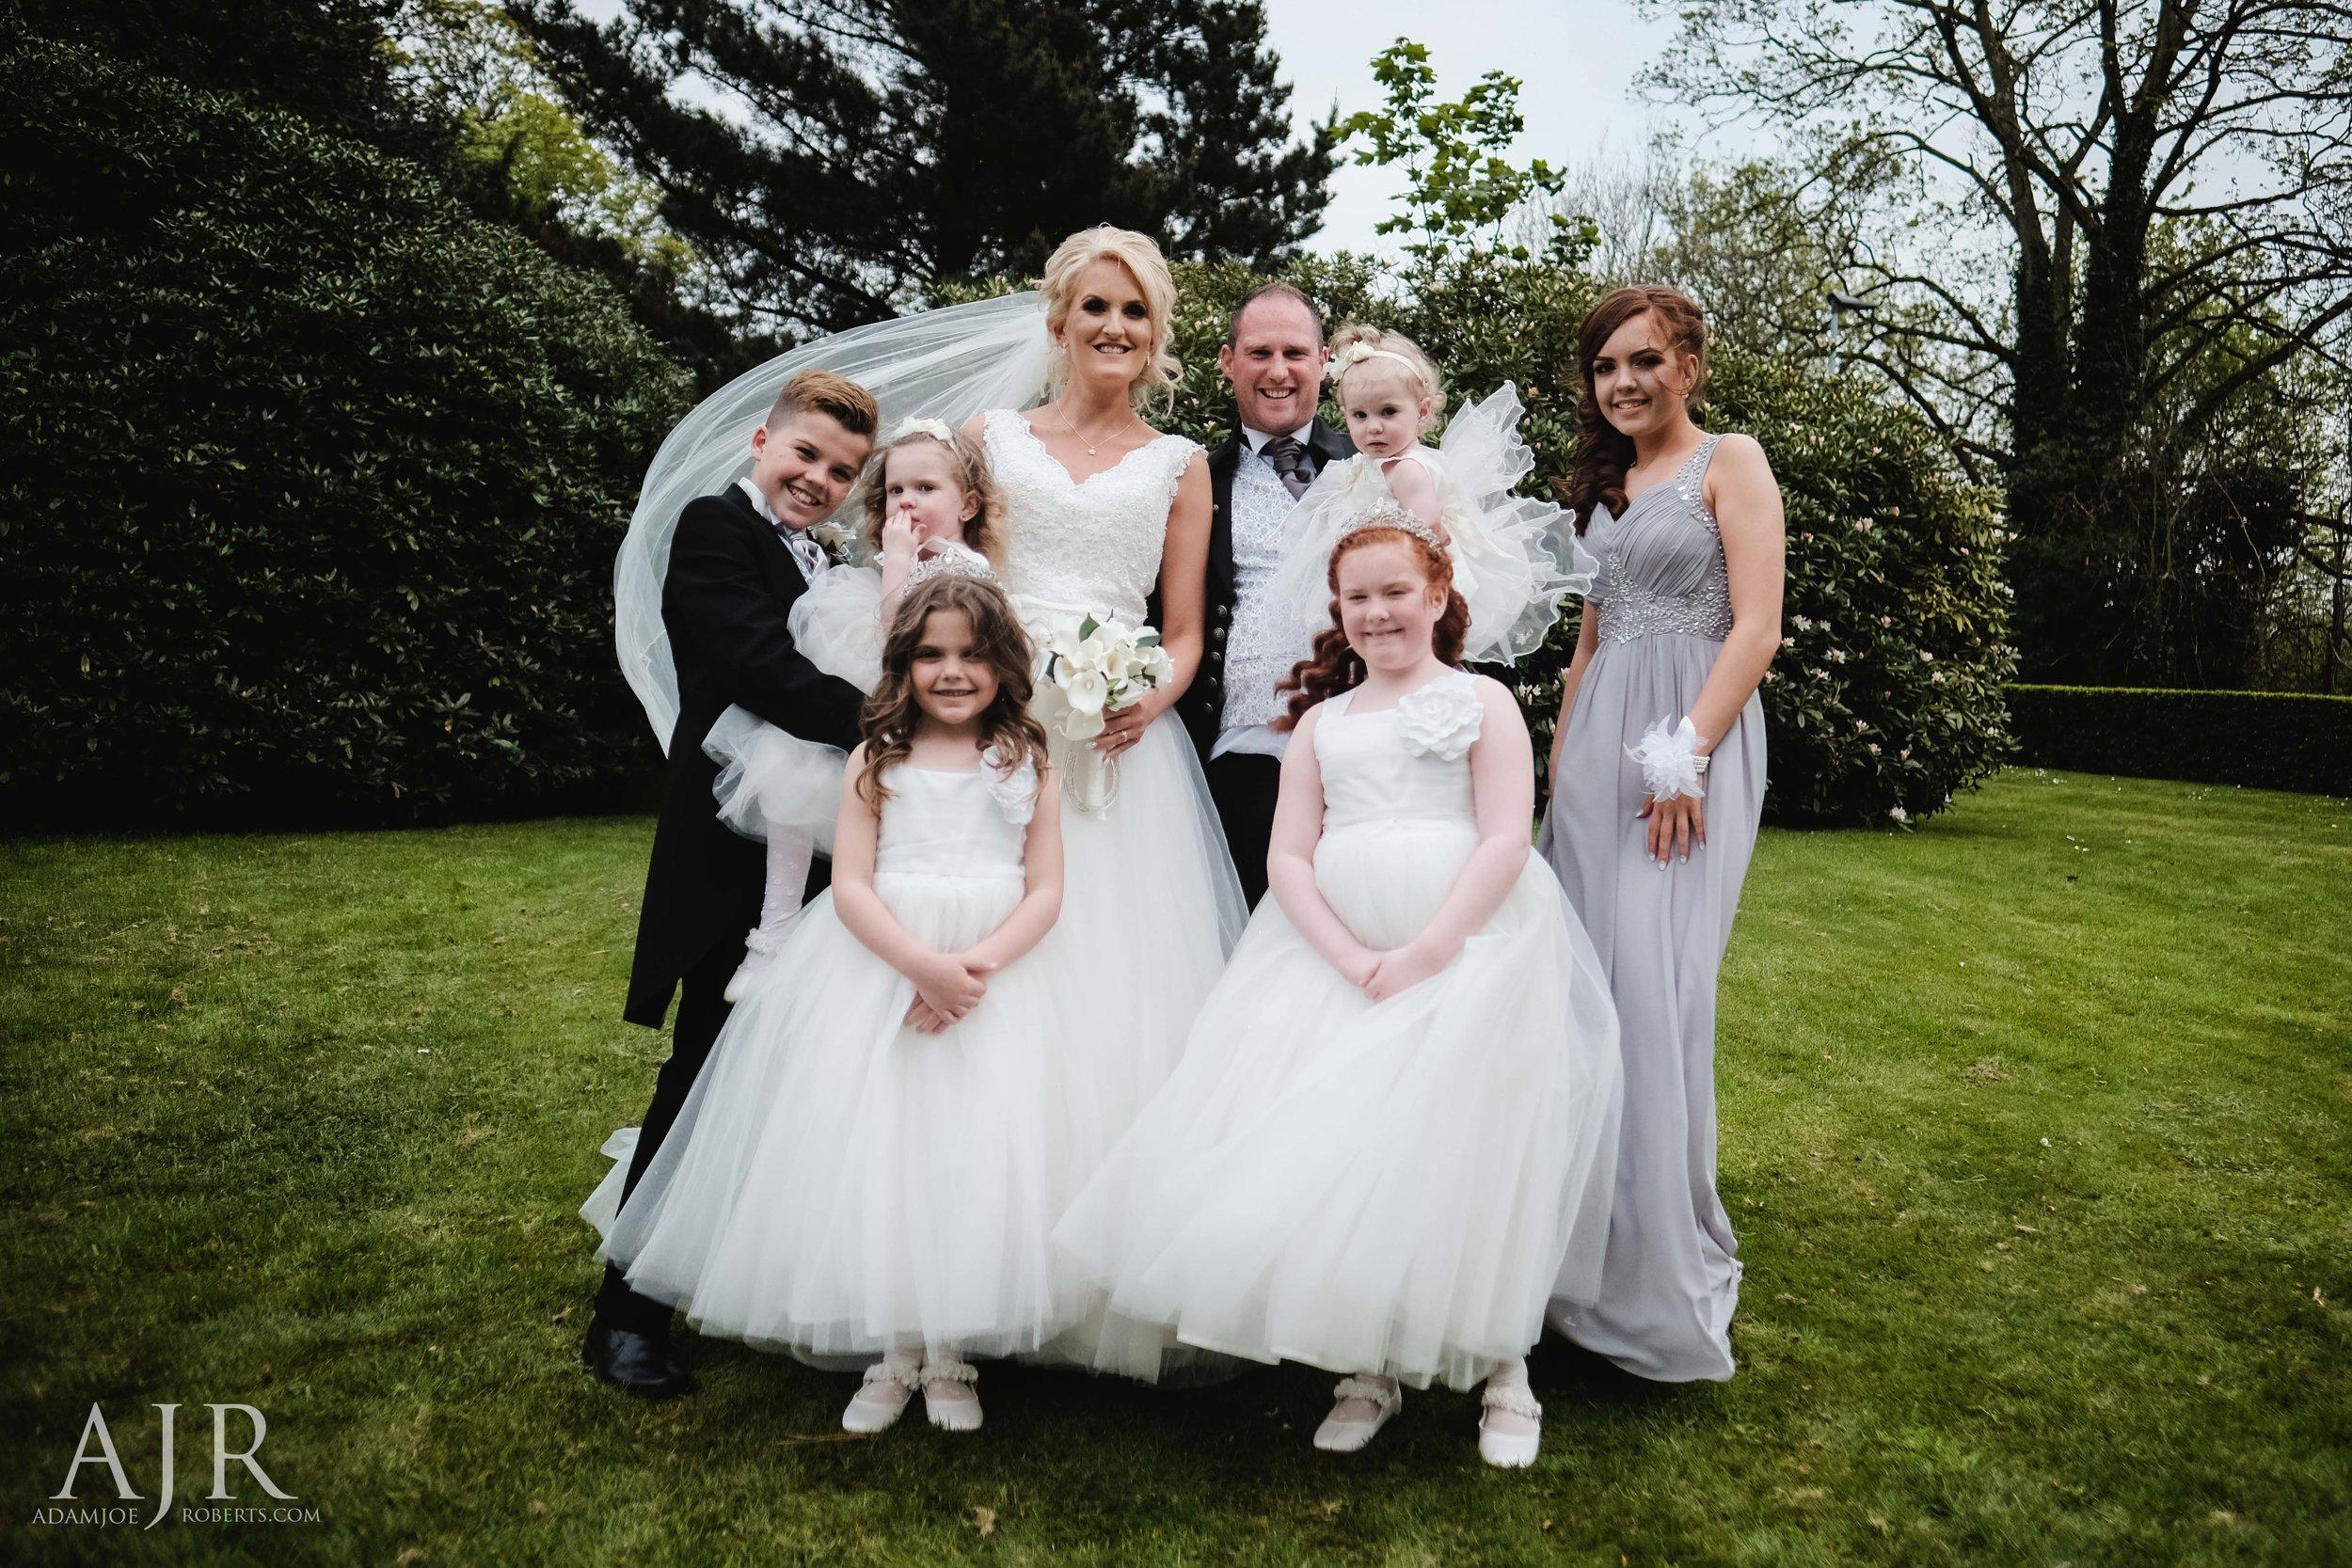 statham lodge wedding photographer cheshire wedding photographer (11 of 11).jpg